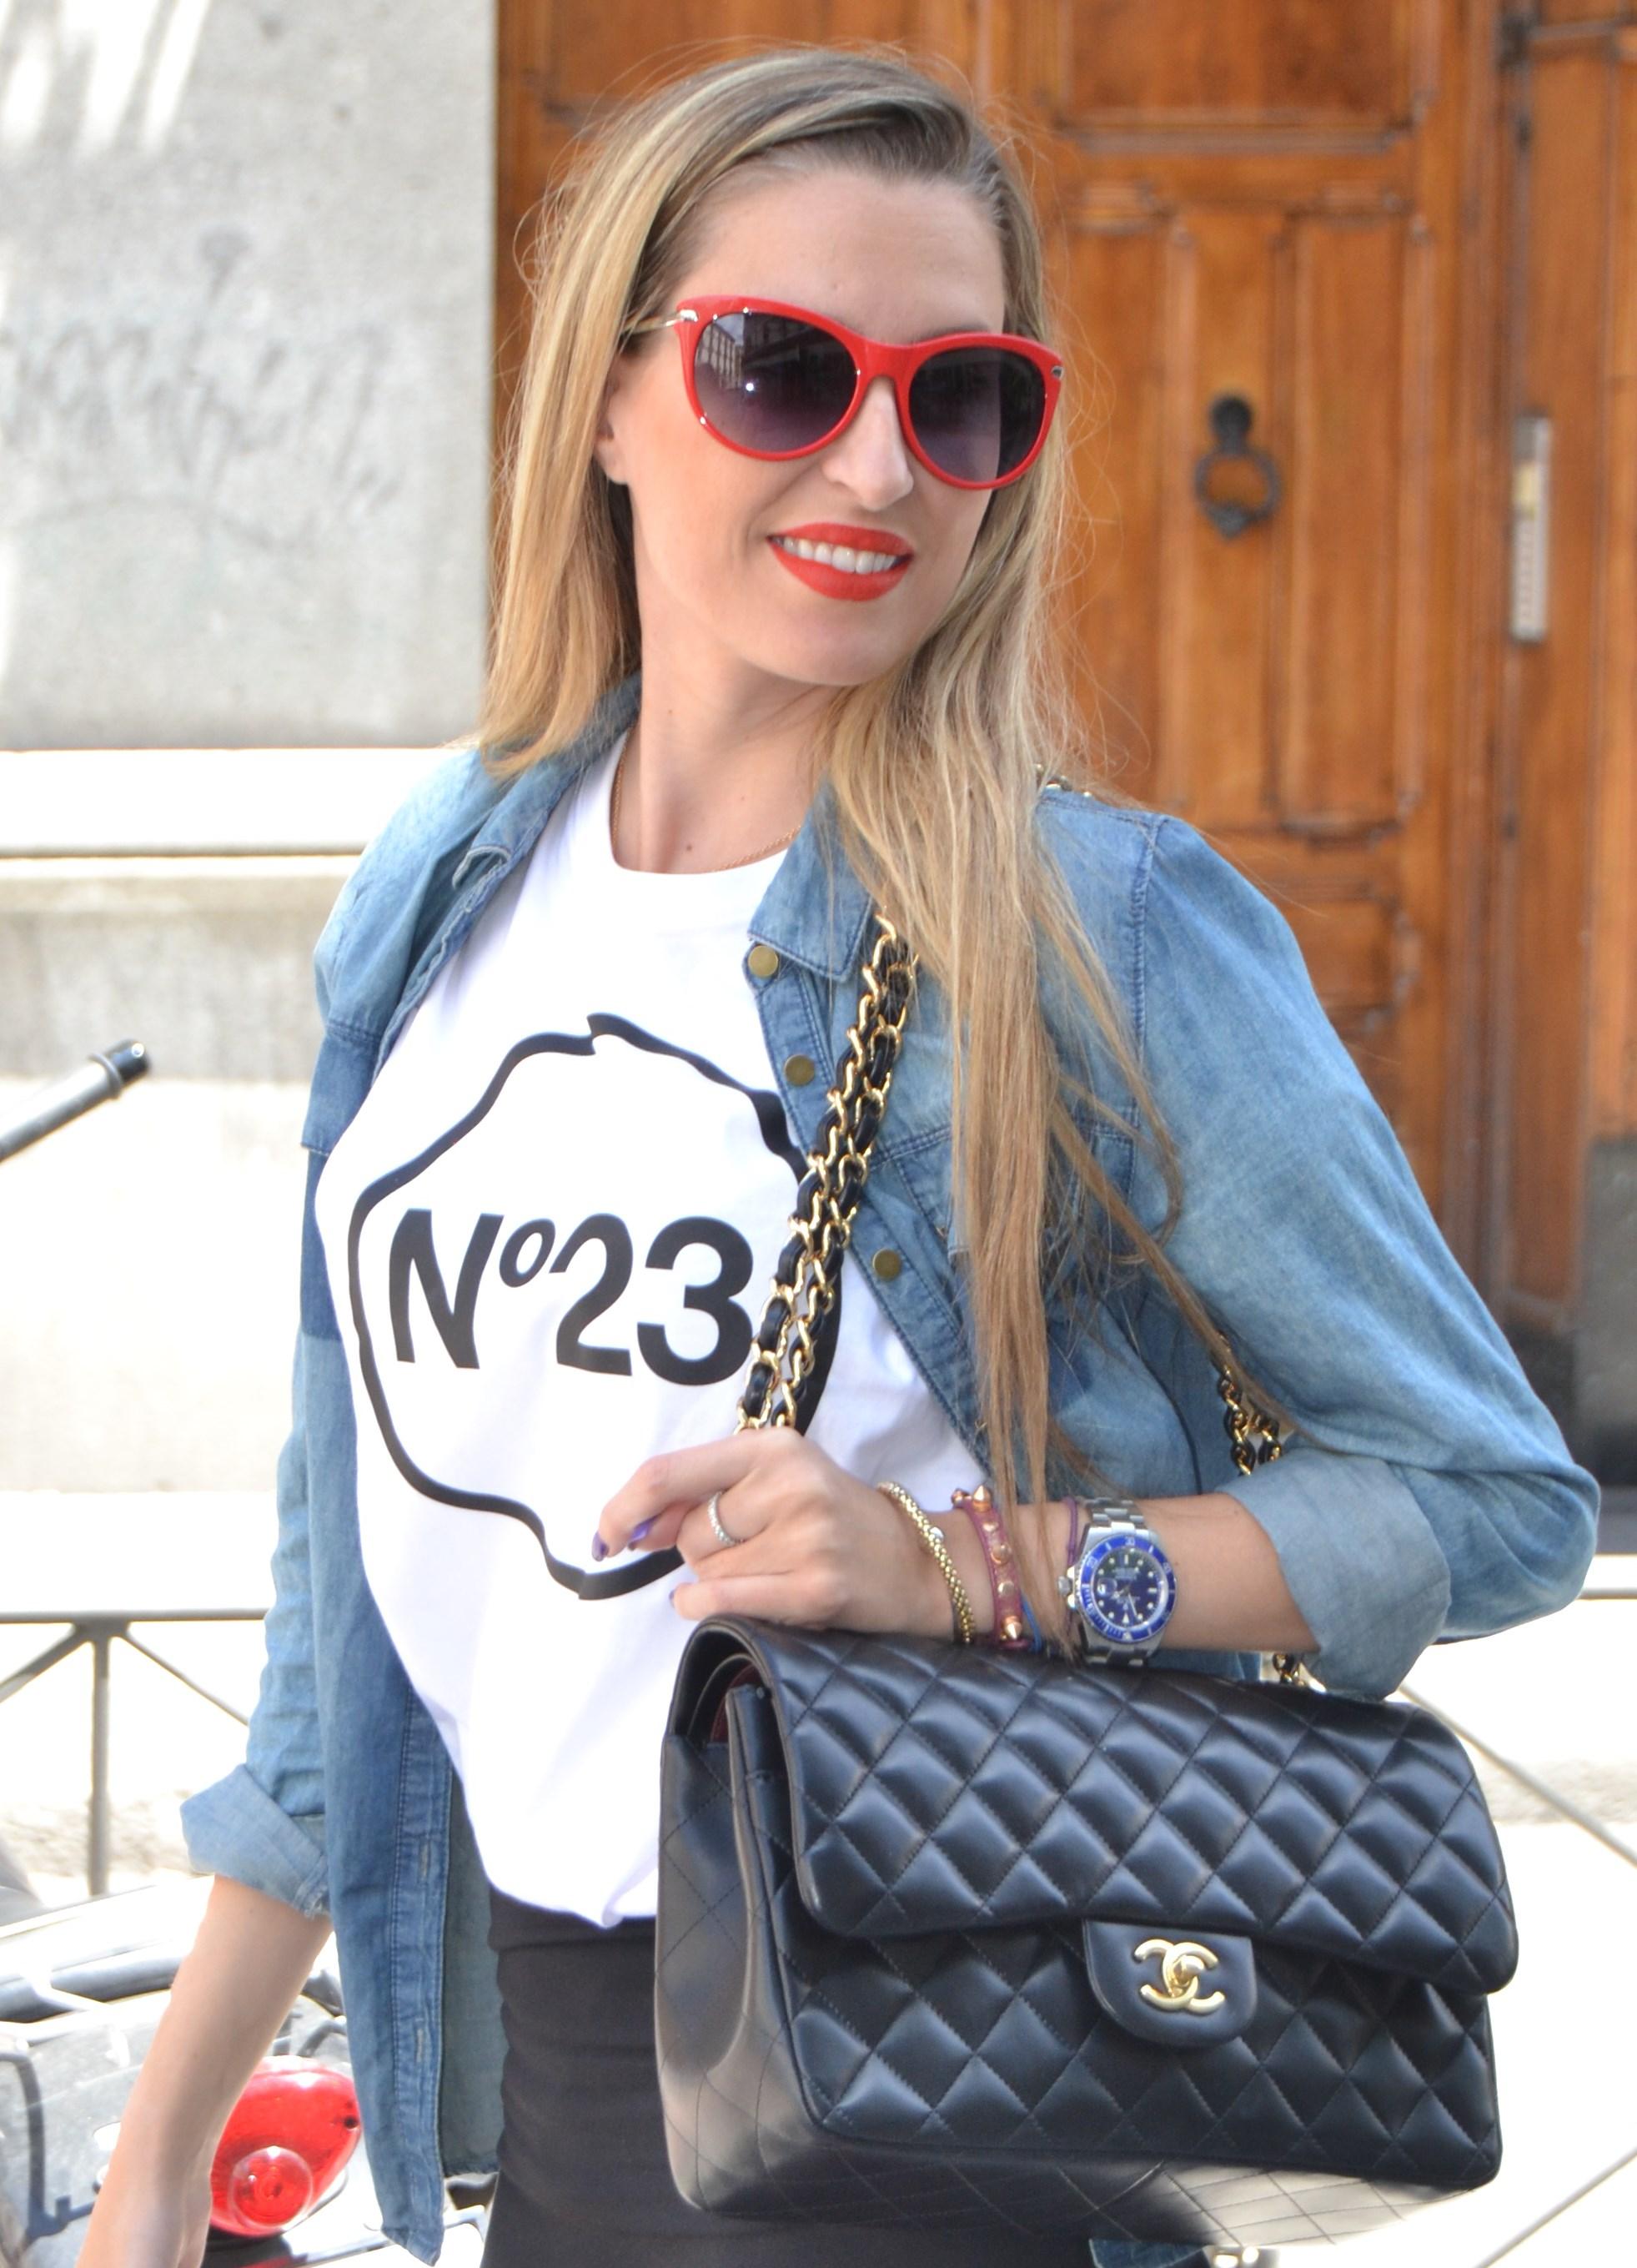 Nike_Free_FlyKnight_Sneakers_Chanel_255_Chanel_Bag_Guess_Sunglasses_Denim_Shirt_Lara_Martin_Gilarranz_Bymyheels (7)